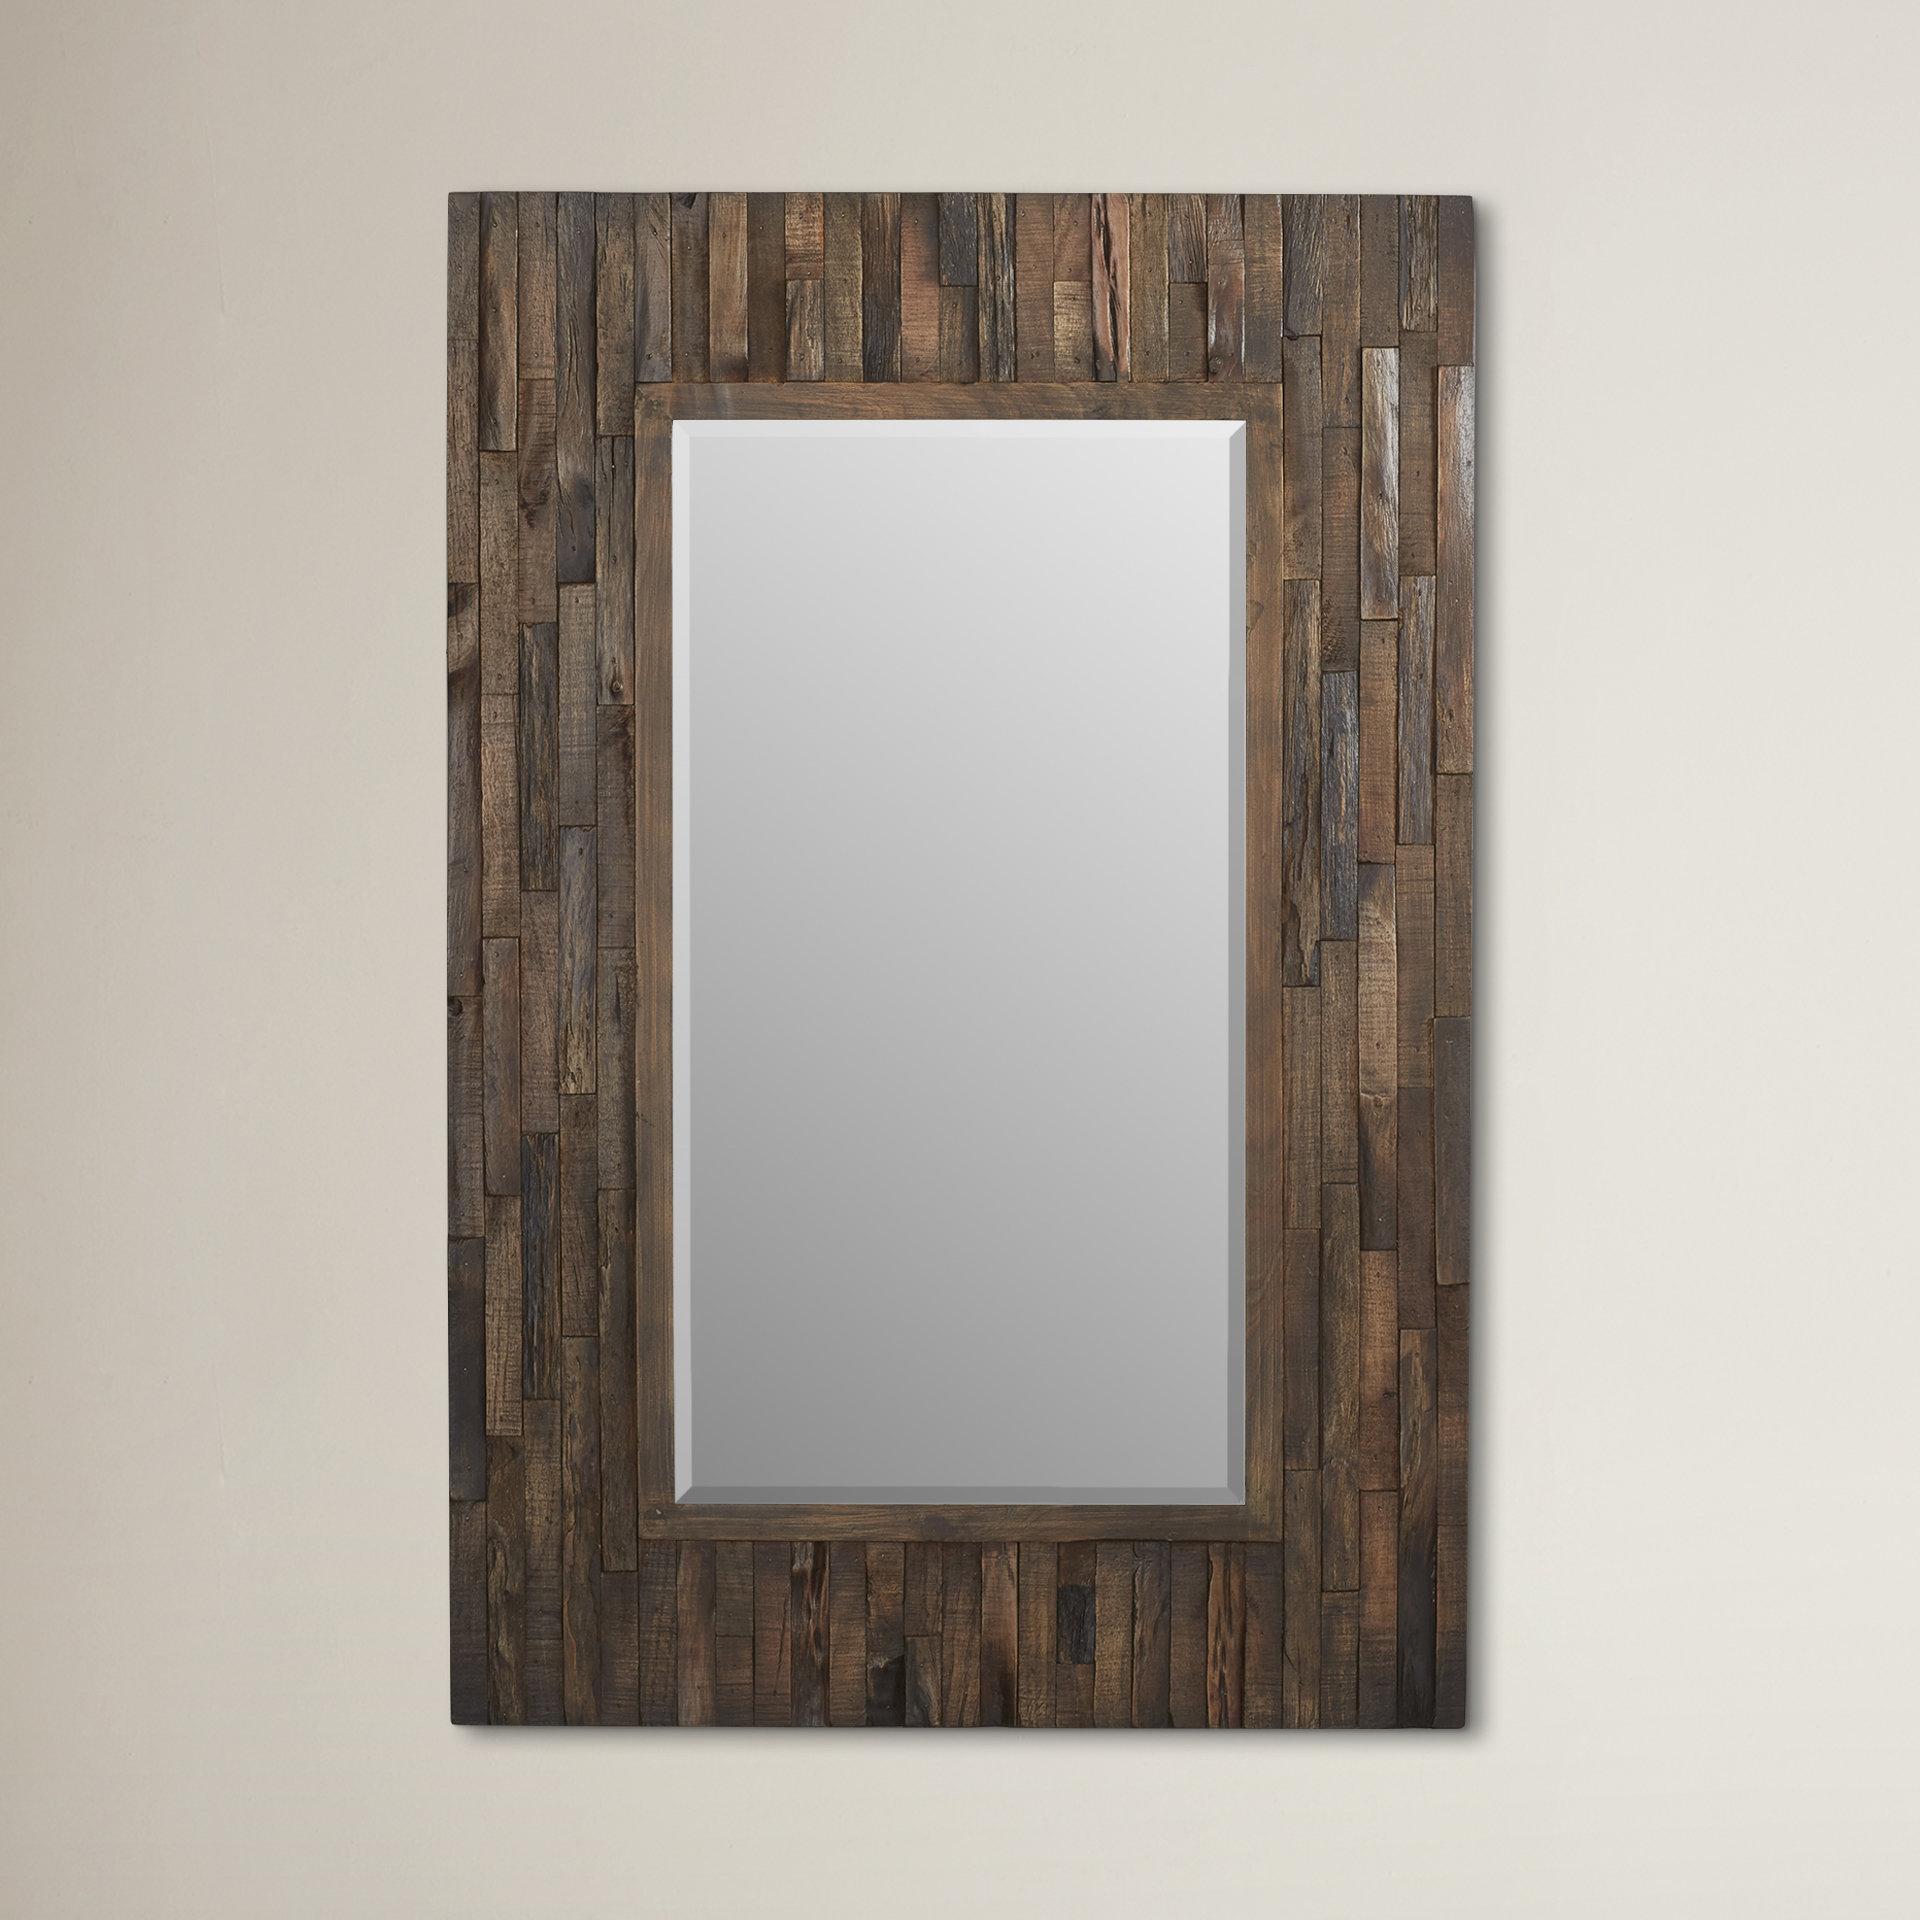 Lewis Rectangular Wall Mirror With Regard To Janie Rectangular Wall Mirrors (Image 8 of 20)